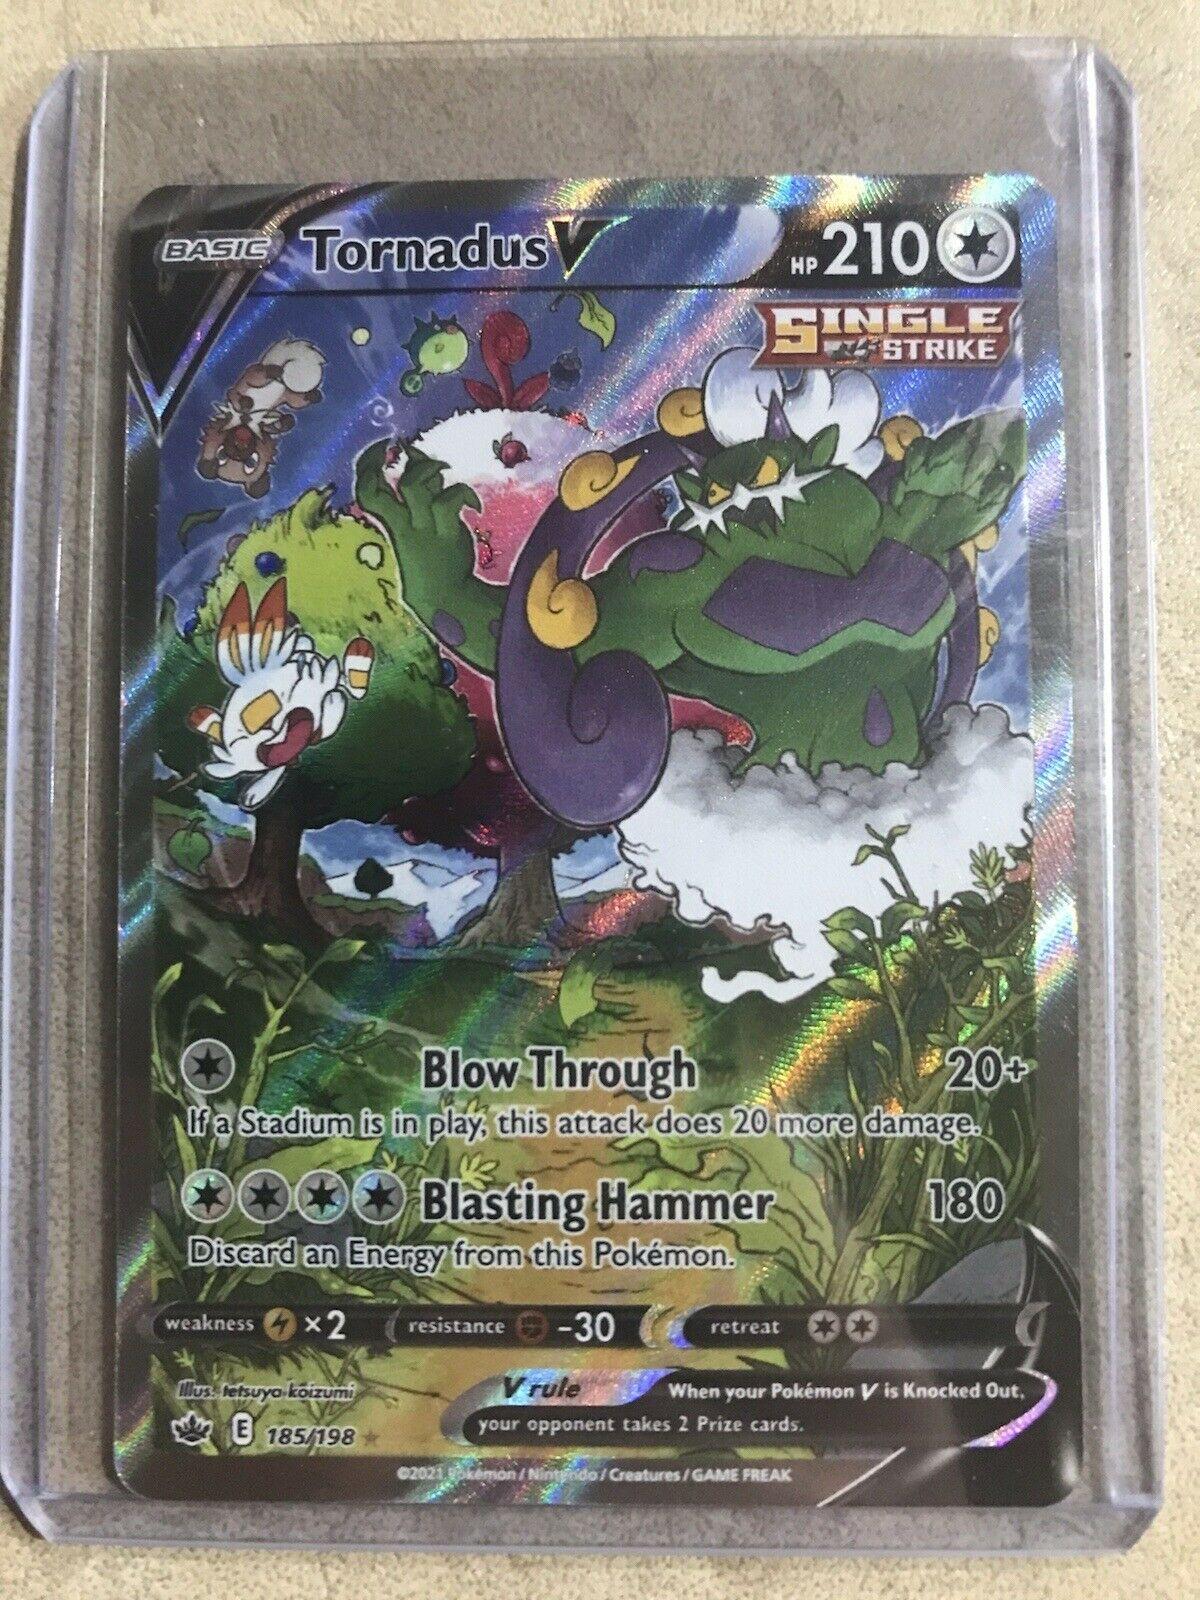 Pokémon TCG Chilling Reign Tornadus V Alt Art 185/198 NM